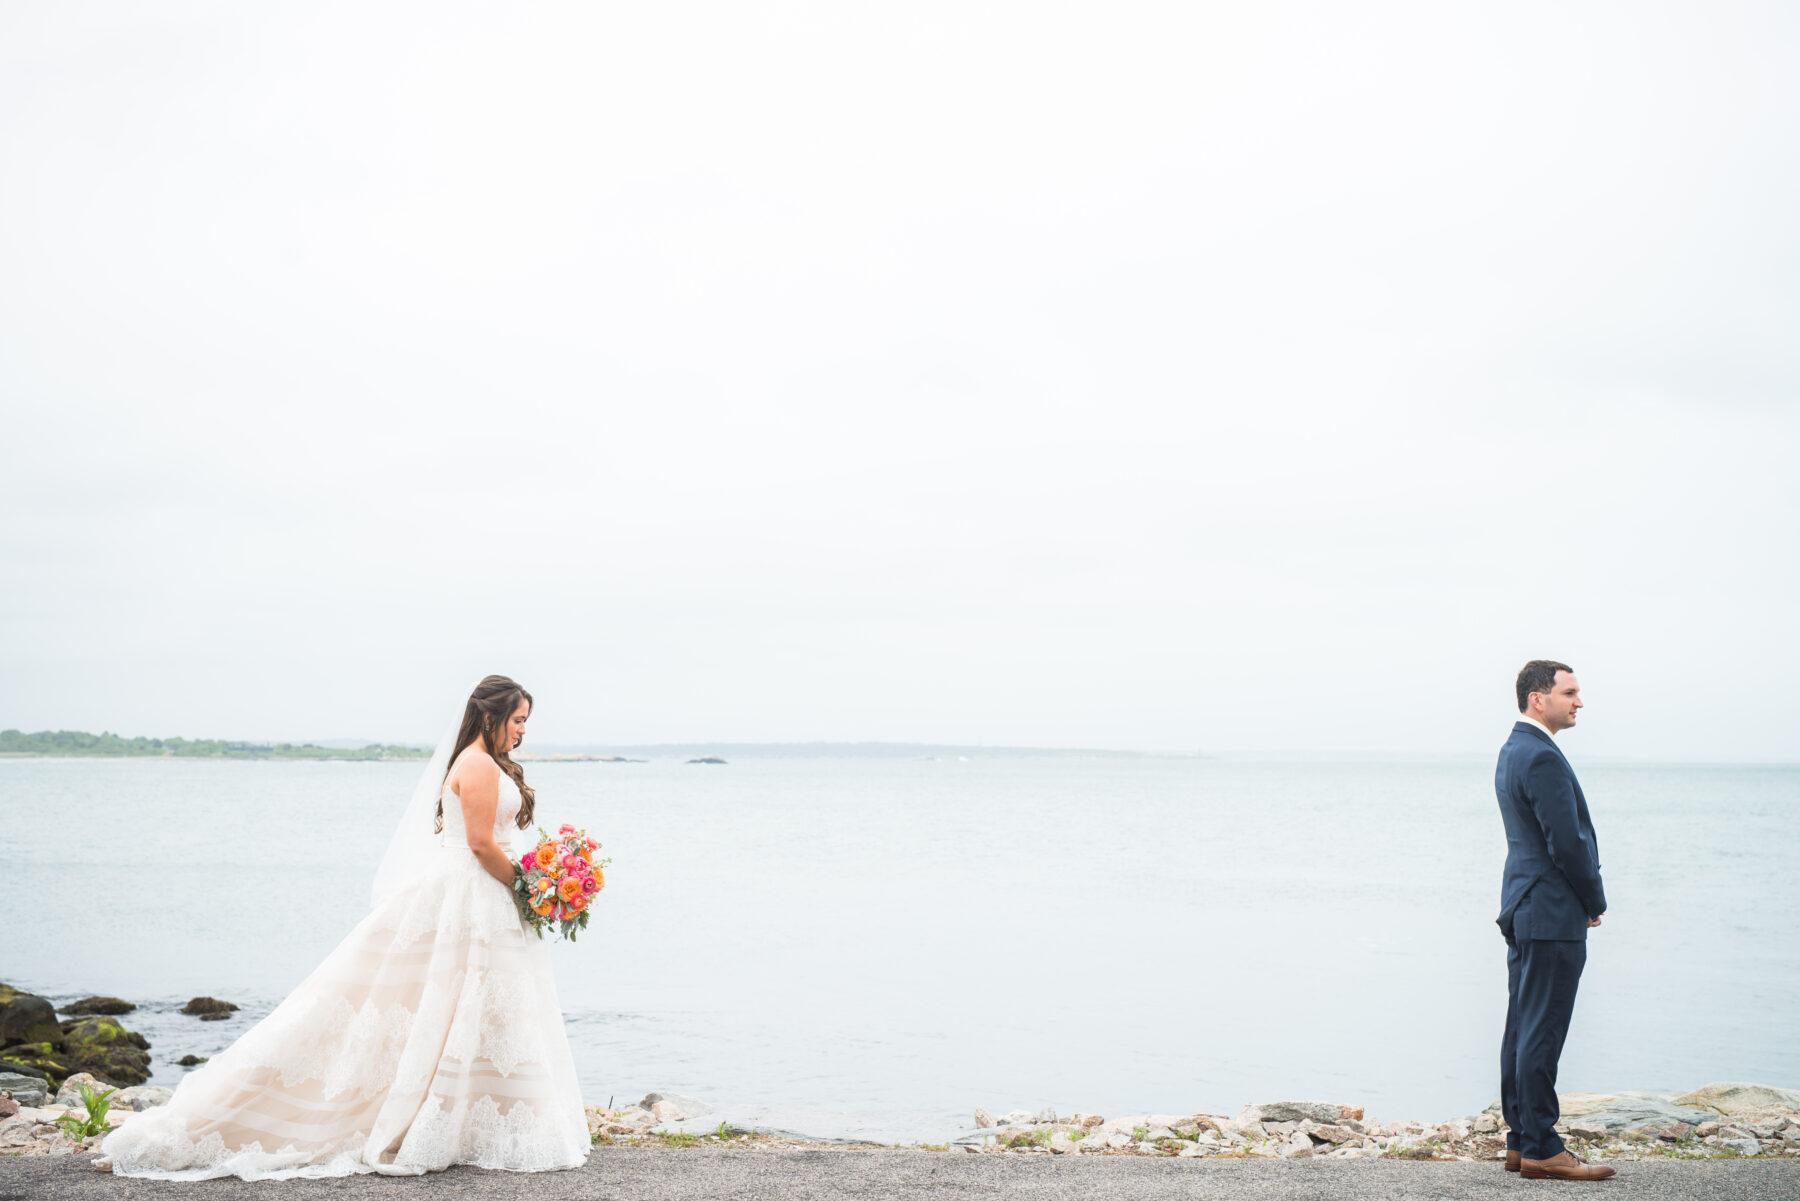 North Beach Club House Wedding Shannon and Brian Blueflash Photography 3